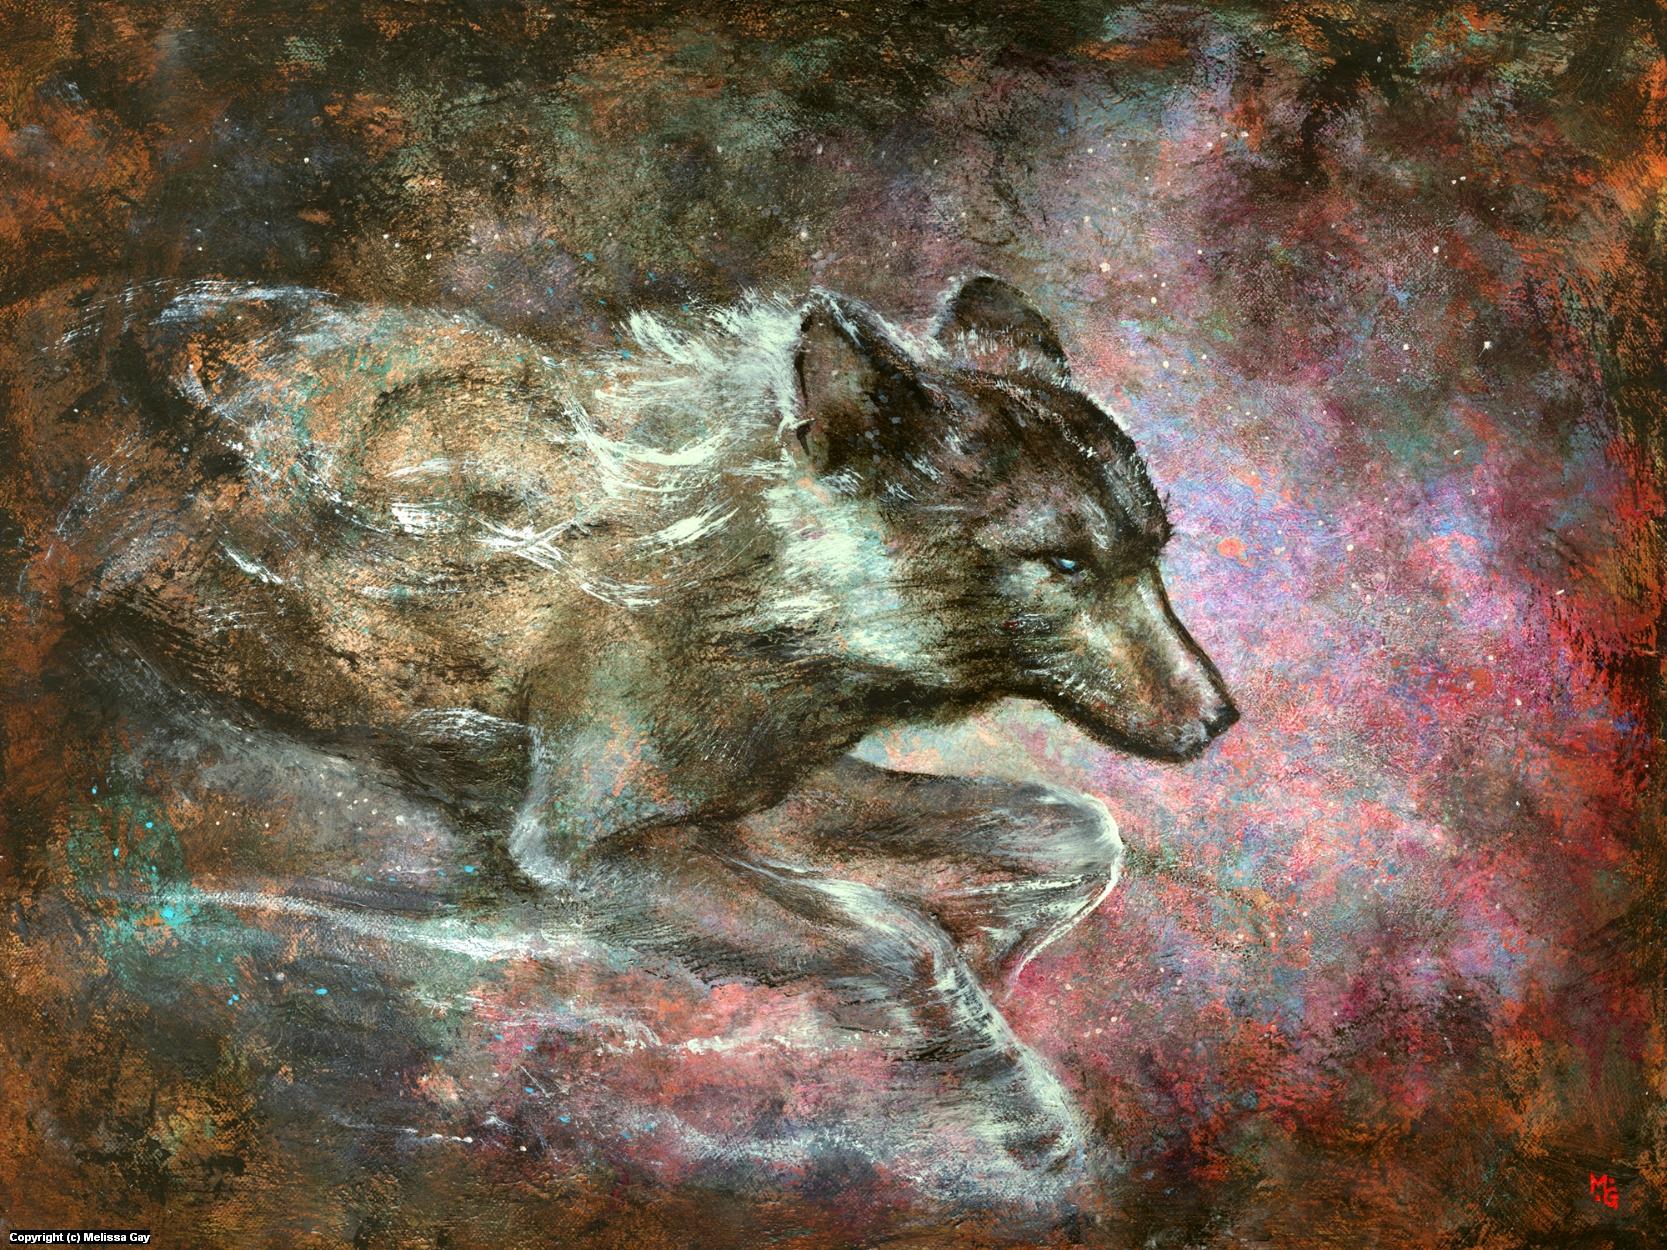 Grandfather Fox Artwork by Melissa Gay